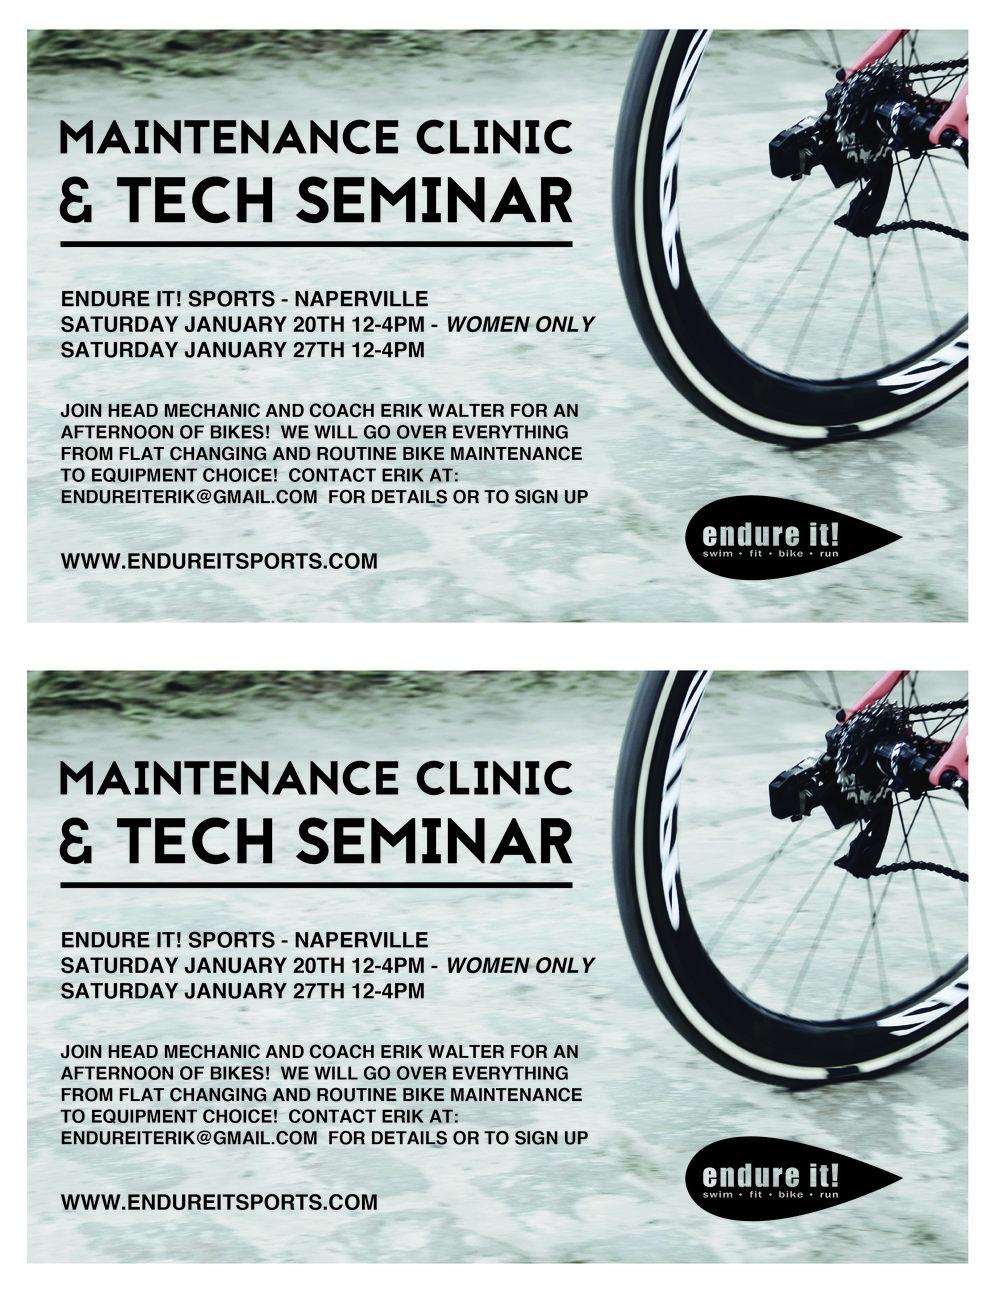 Maintenance Clinic & Tech Seminar-01.jpg